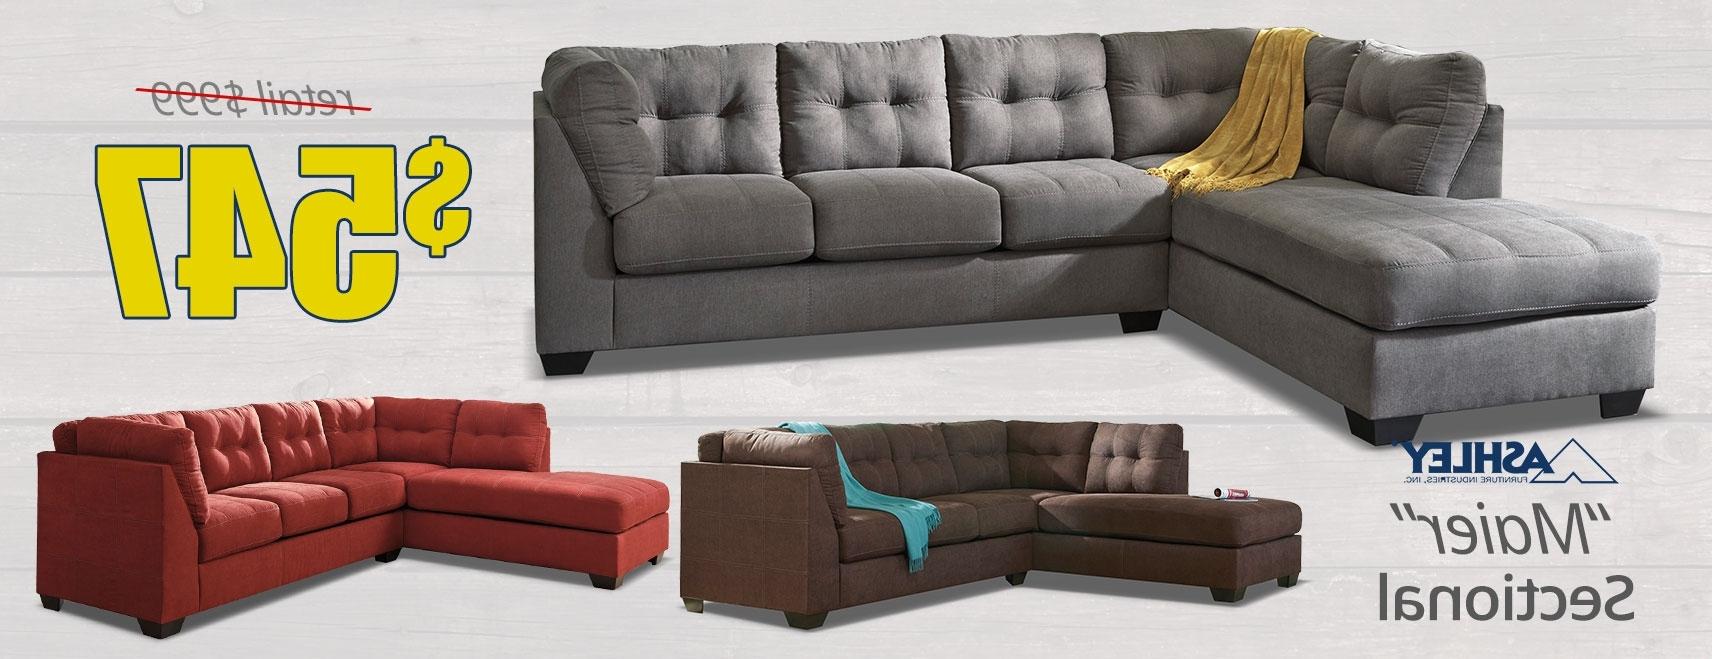 Ohio's #1 Furniture & Mattress Store Regarding Cincinnati Sectional Sofas (View 12 of 20)